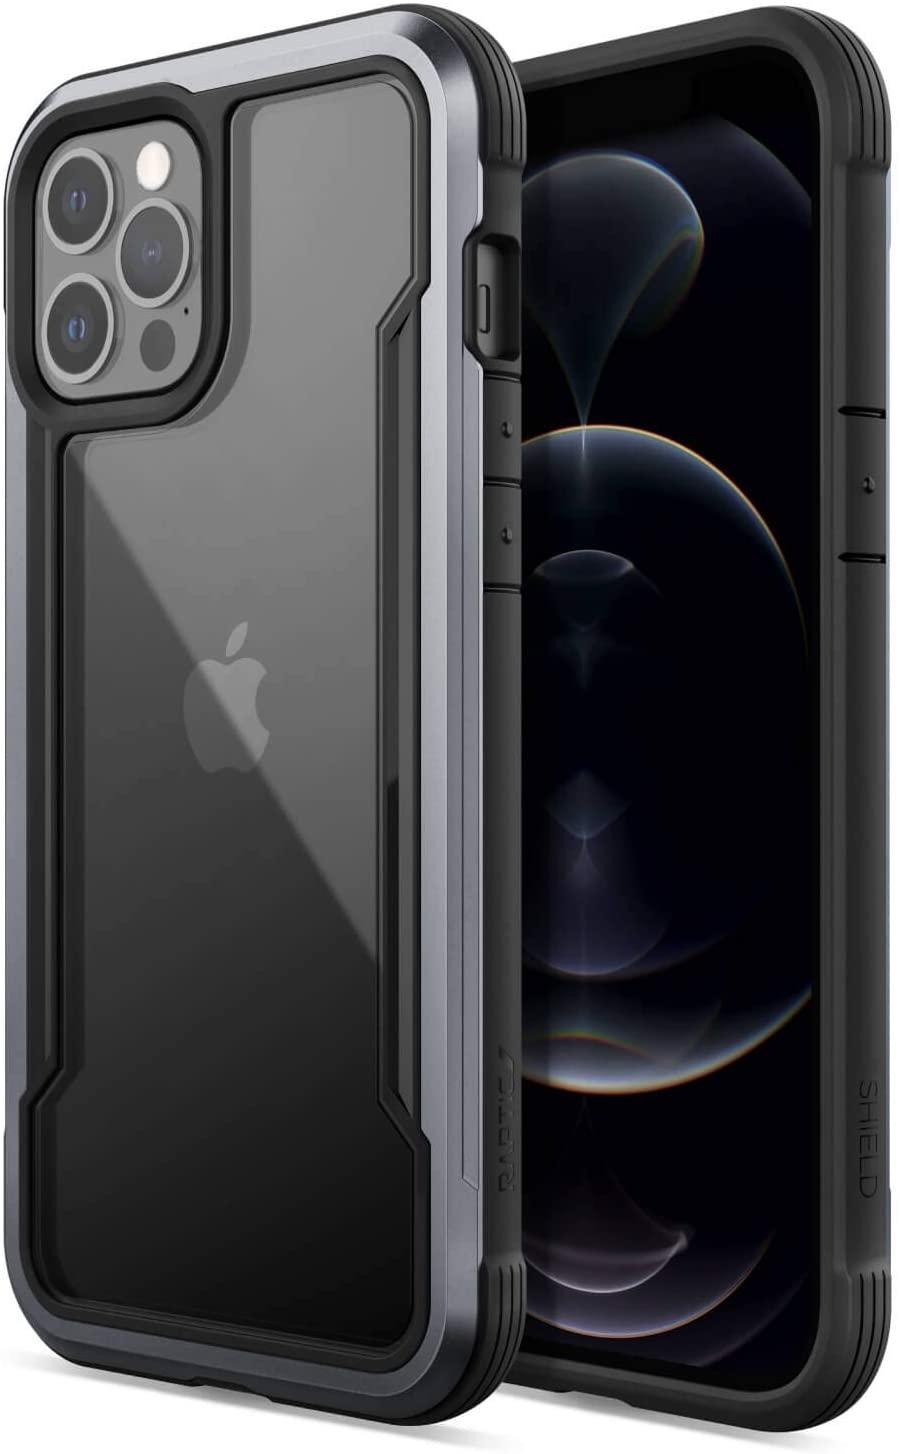 Raptic Shield Etui Aluminiowe do iPhone 12 Pro Max (Drop Test 3m) (Black)